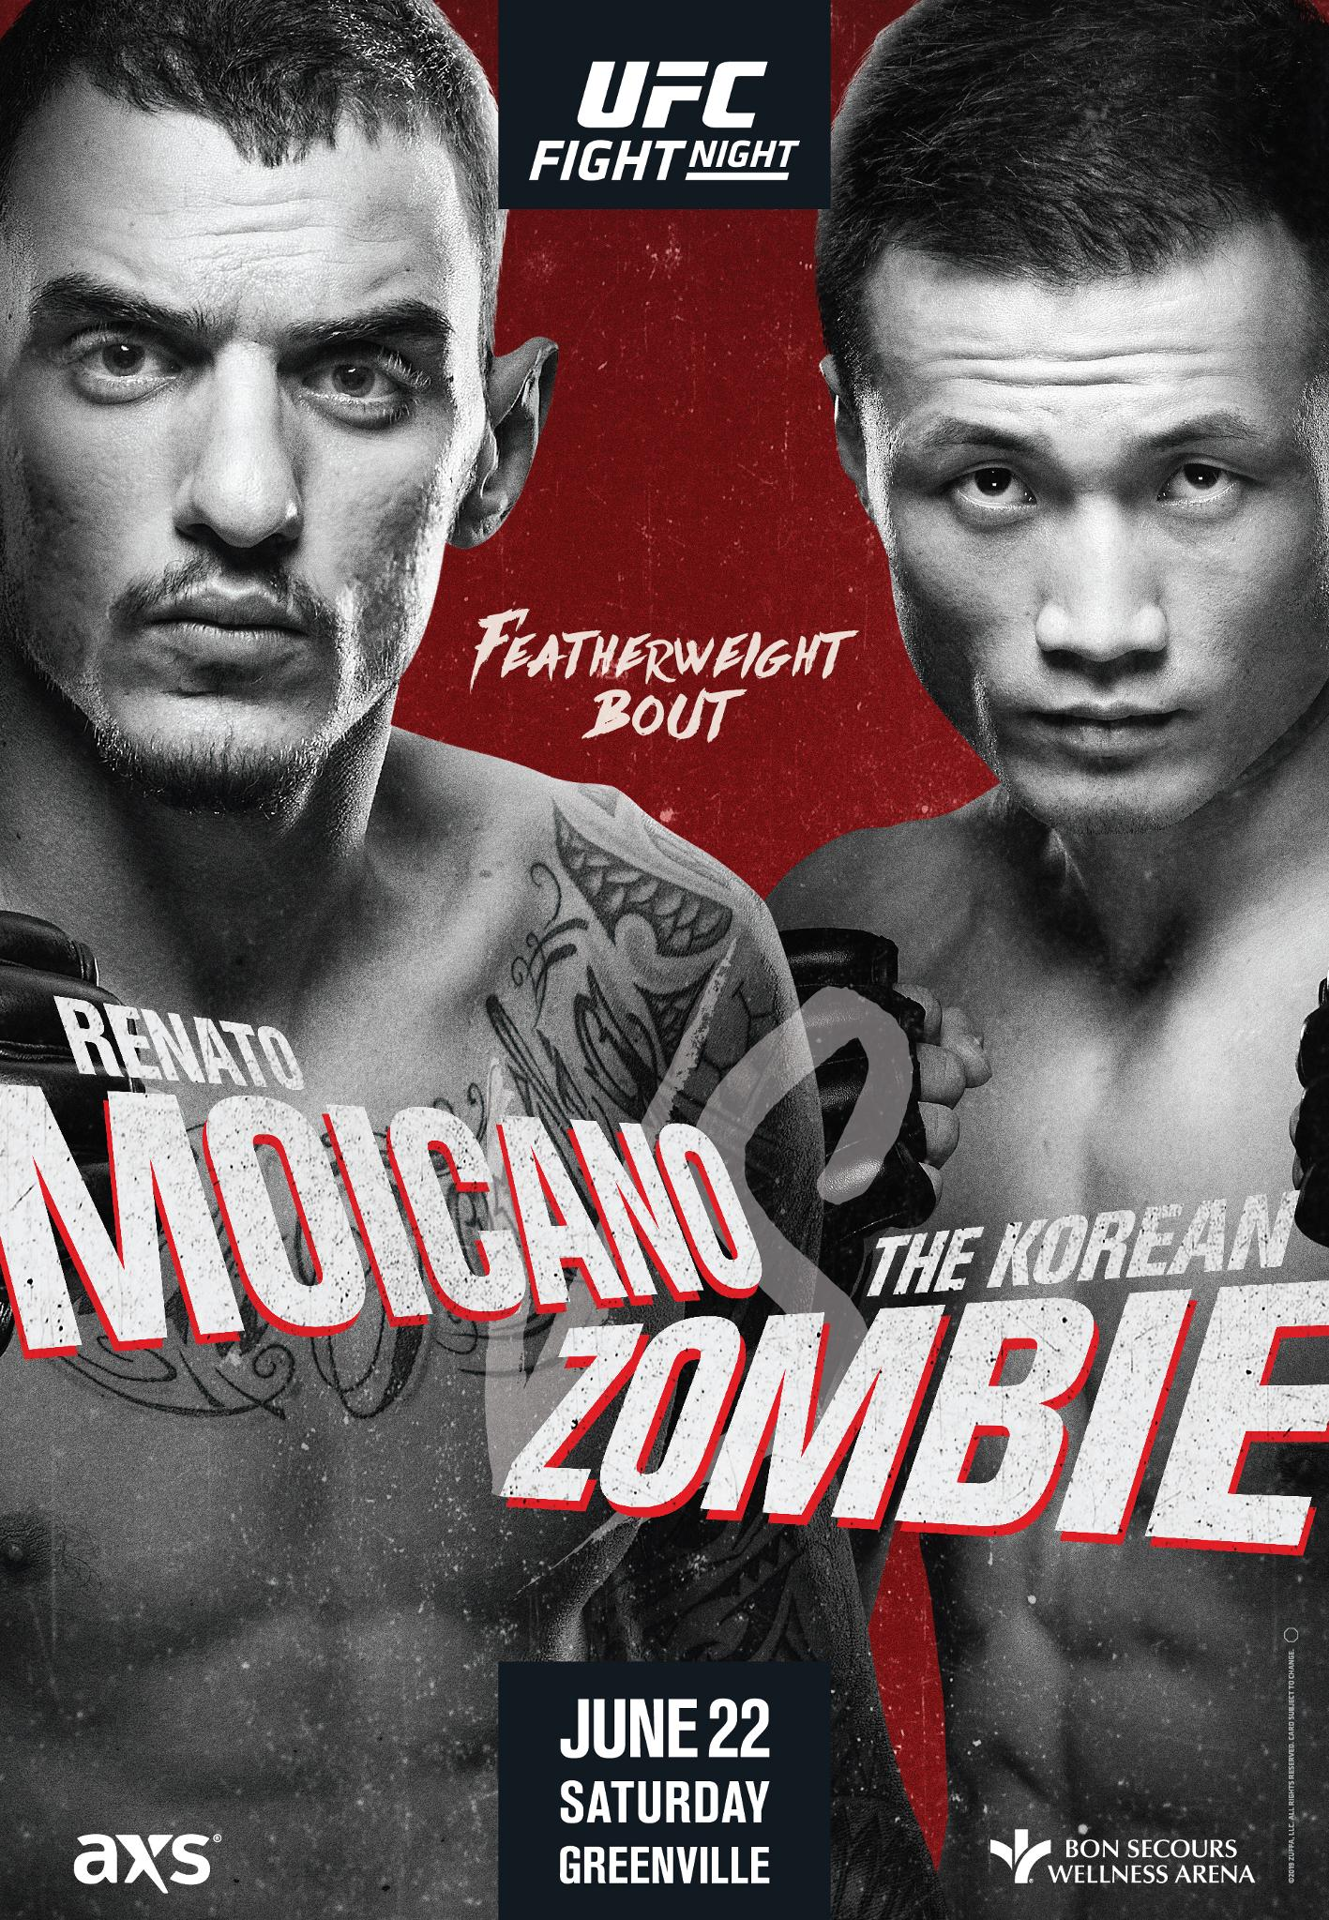 Moicano vs Korean Zombie